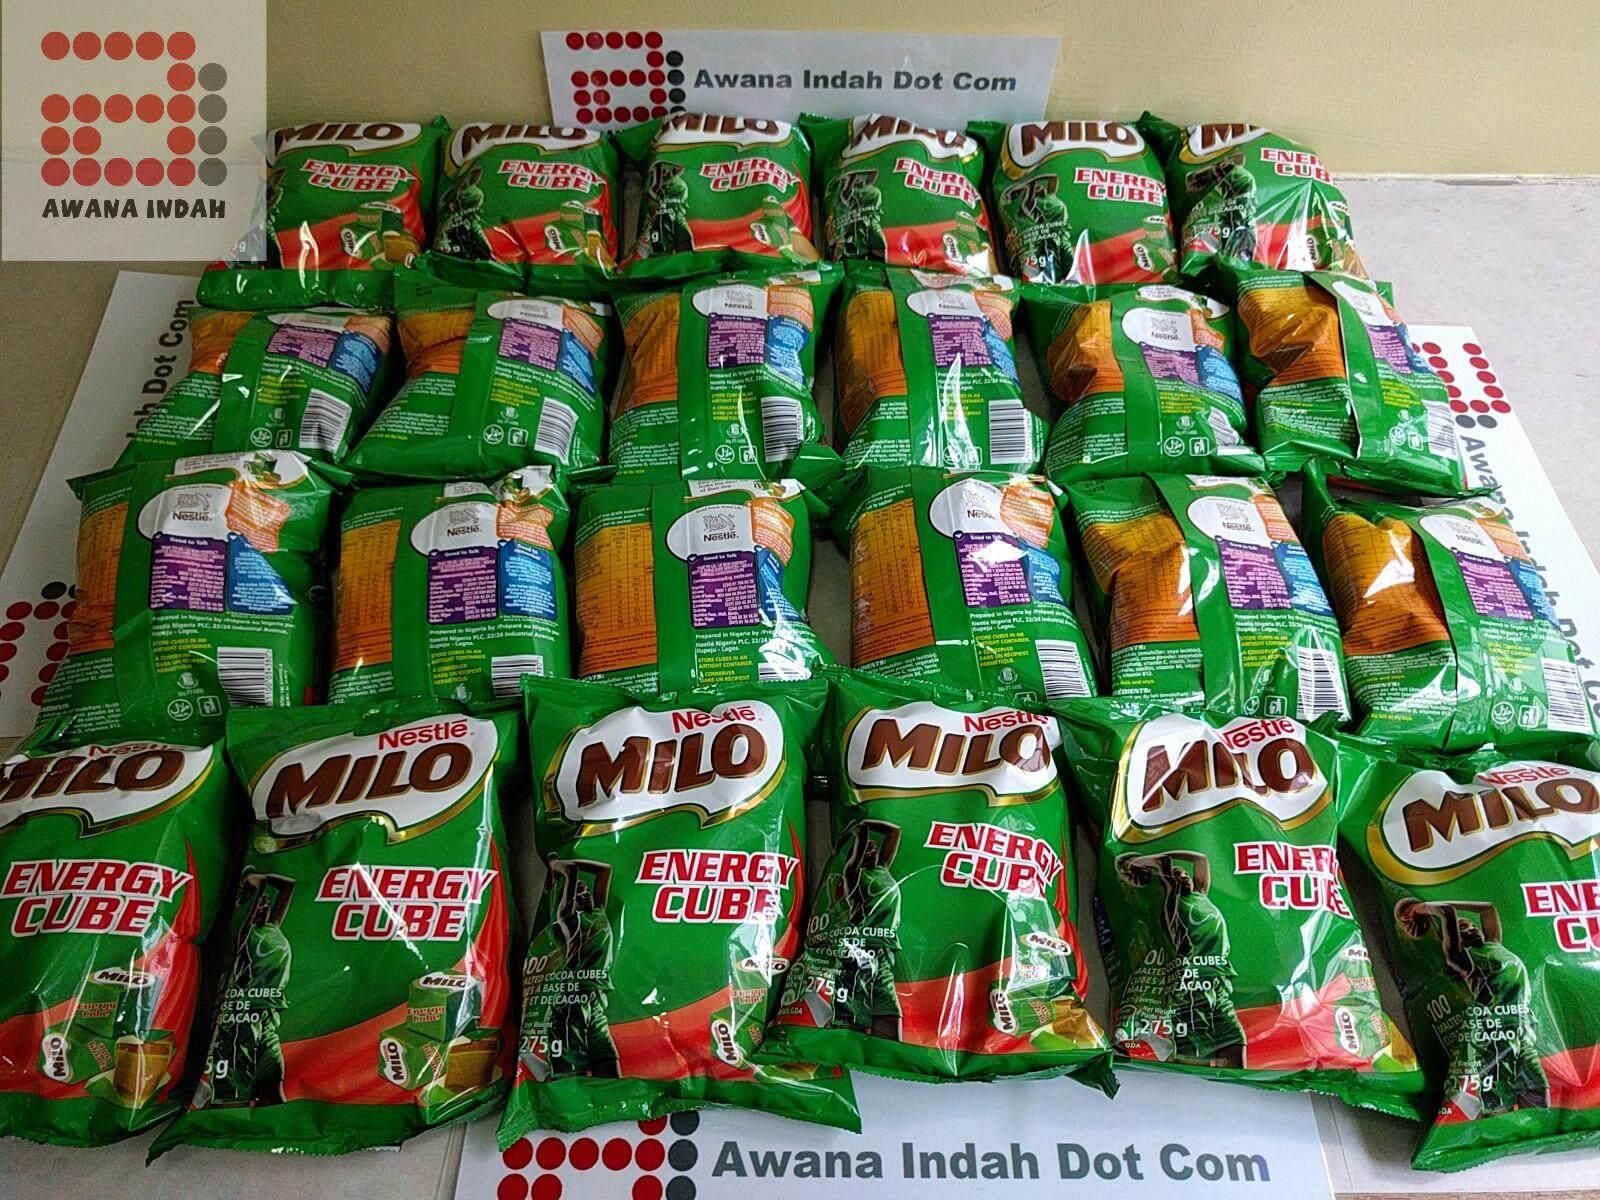 Milo Cube 100pcs Cubes - Made Mar 2019, Expiry Mar 2020_new Stock By Awana Indah Dot Com.